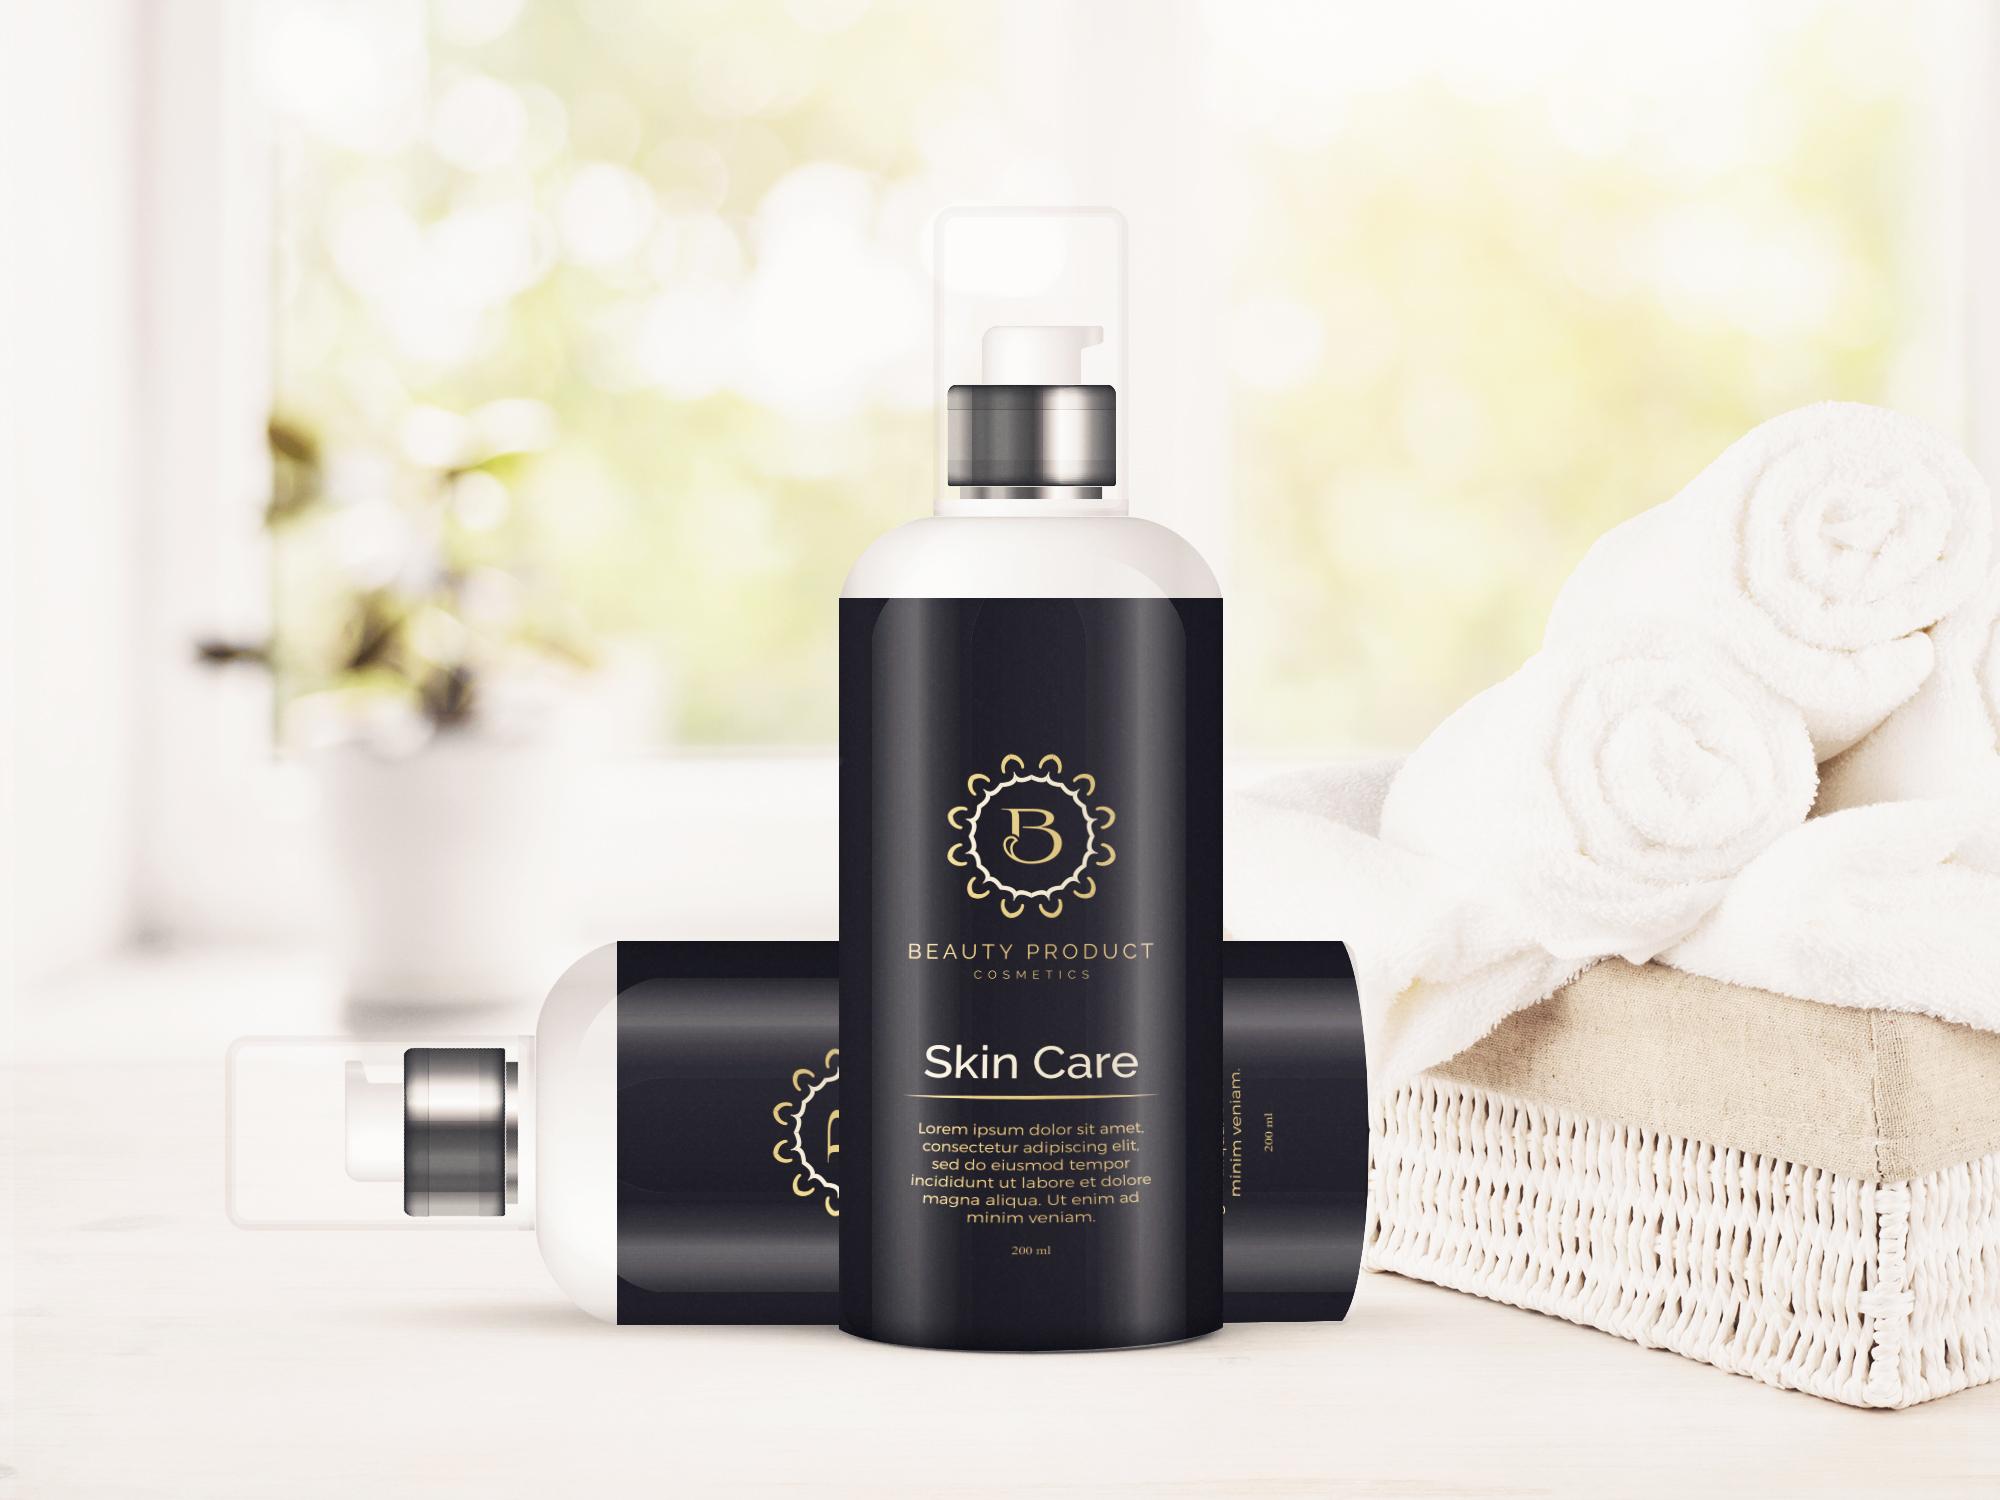 Cosmetic Bottle Mockup, Shampoo and Oil Bottle mock up example image 3